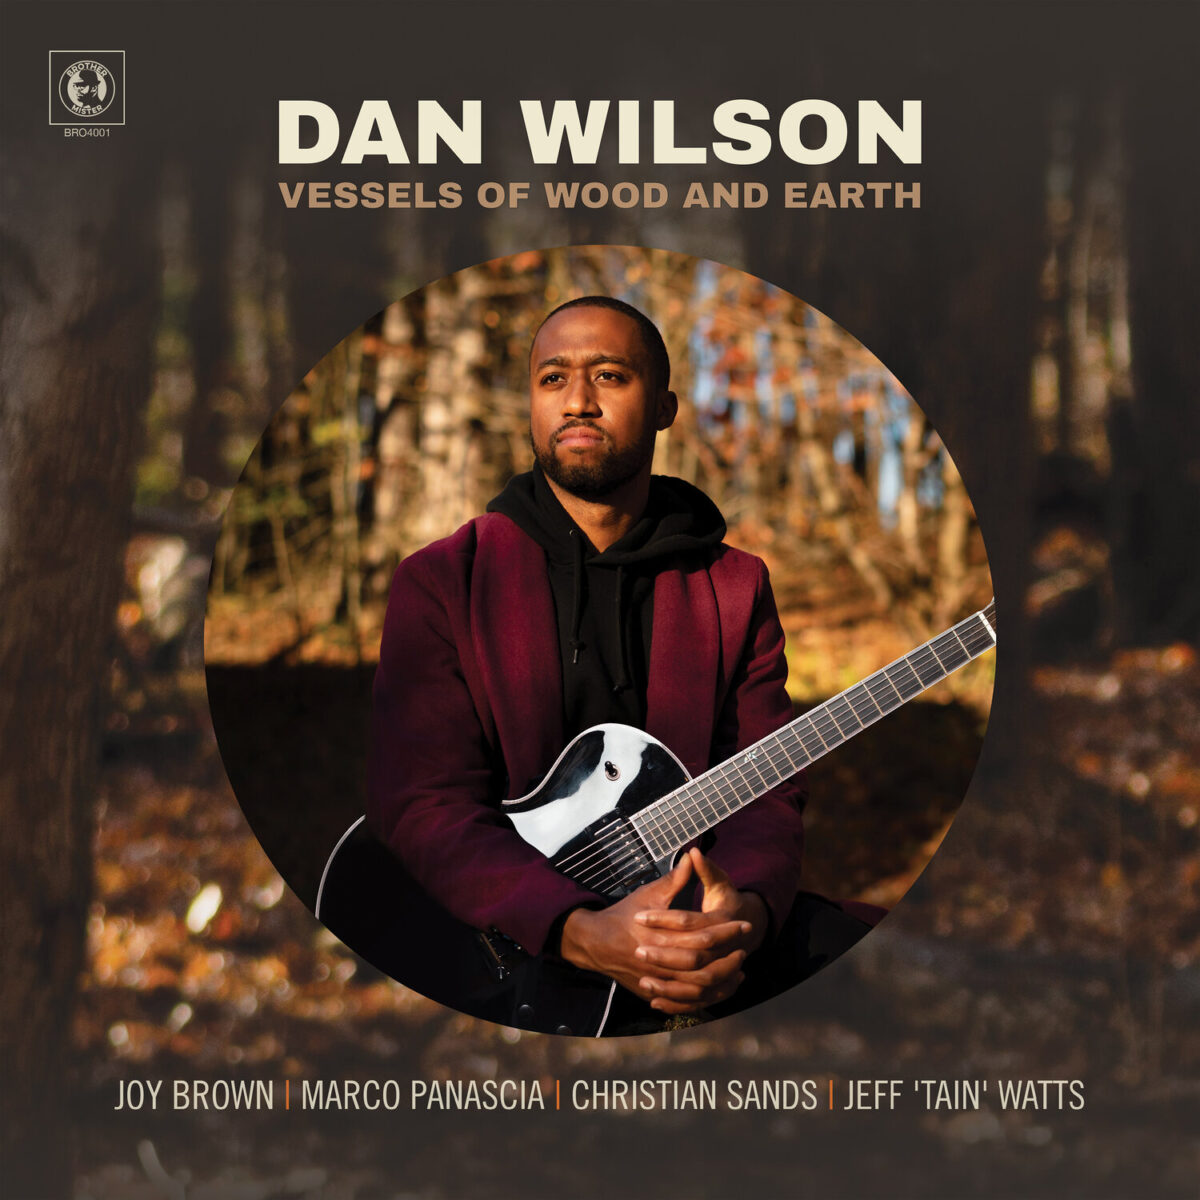 BRO 4001 Dan Wilson_VOWAE cover 3000x3000 rgb (1)